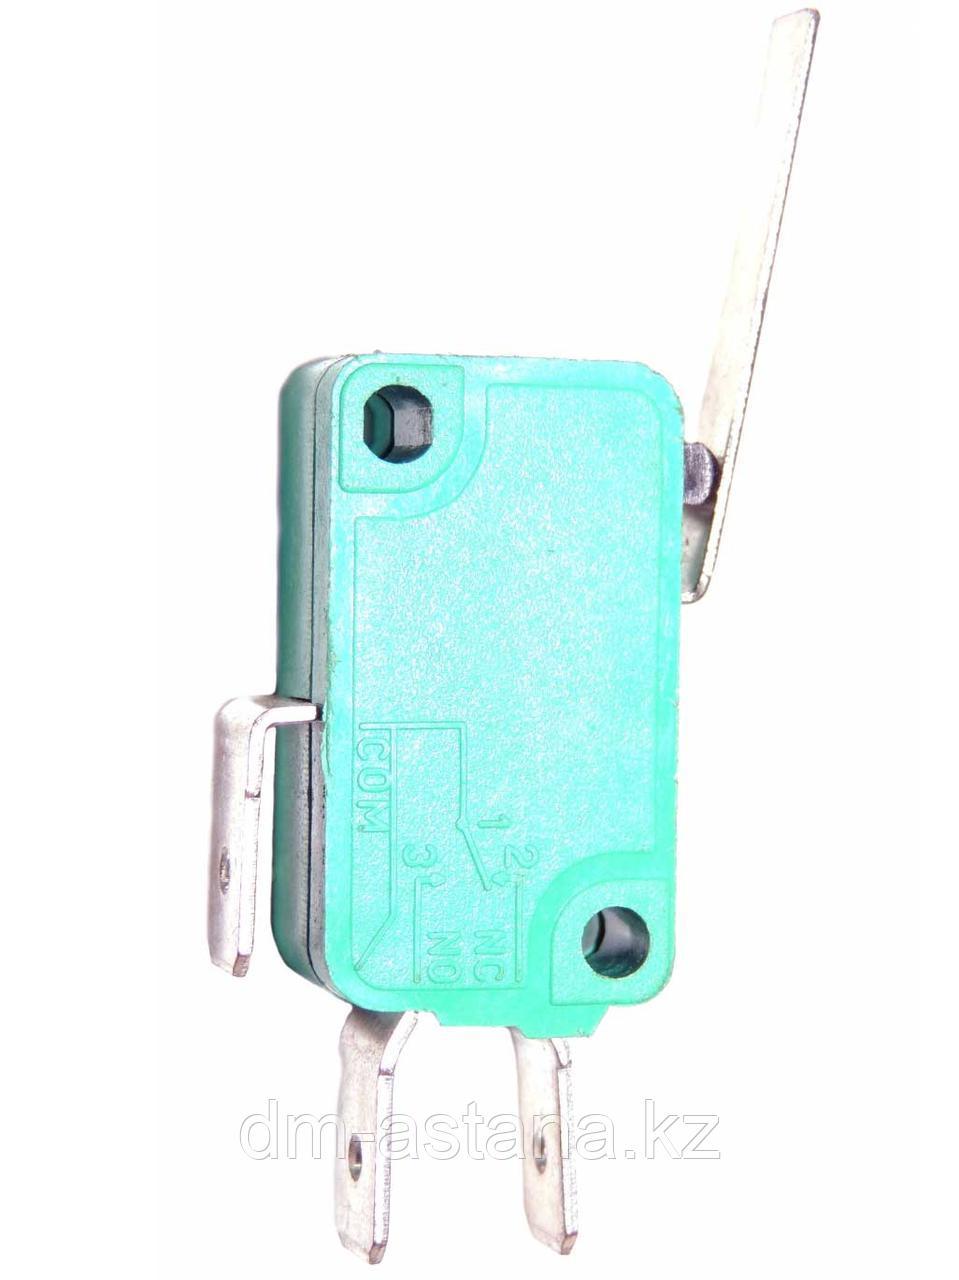 Тумблер (мини) управления зажимами электрический NORDBERG 623